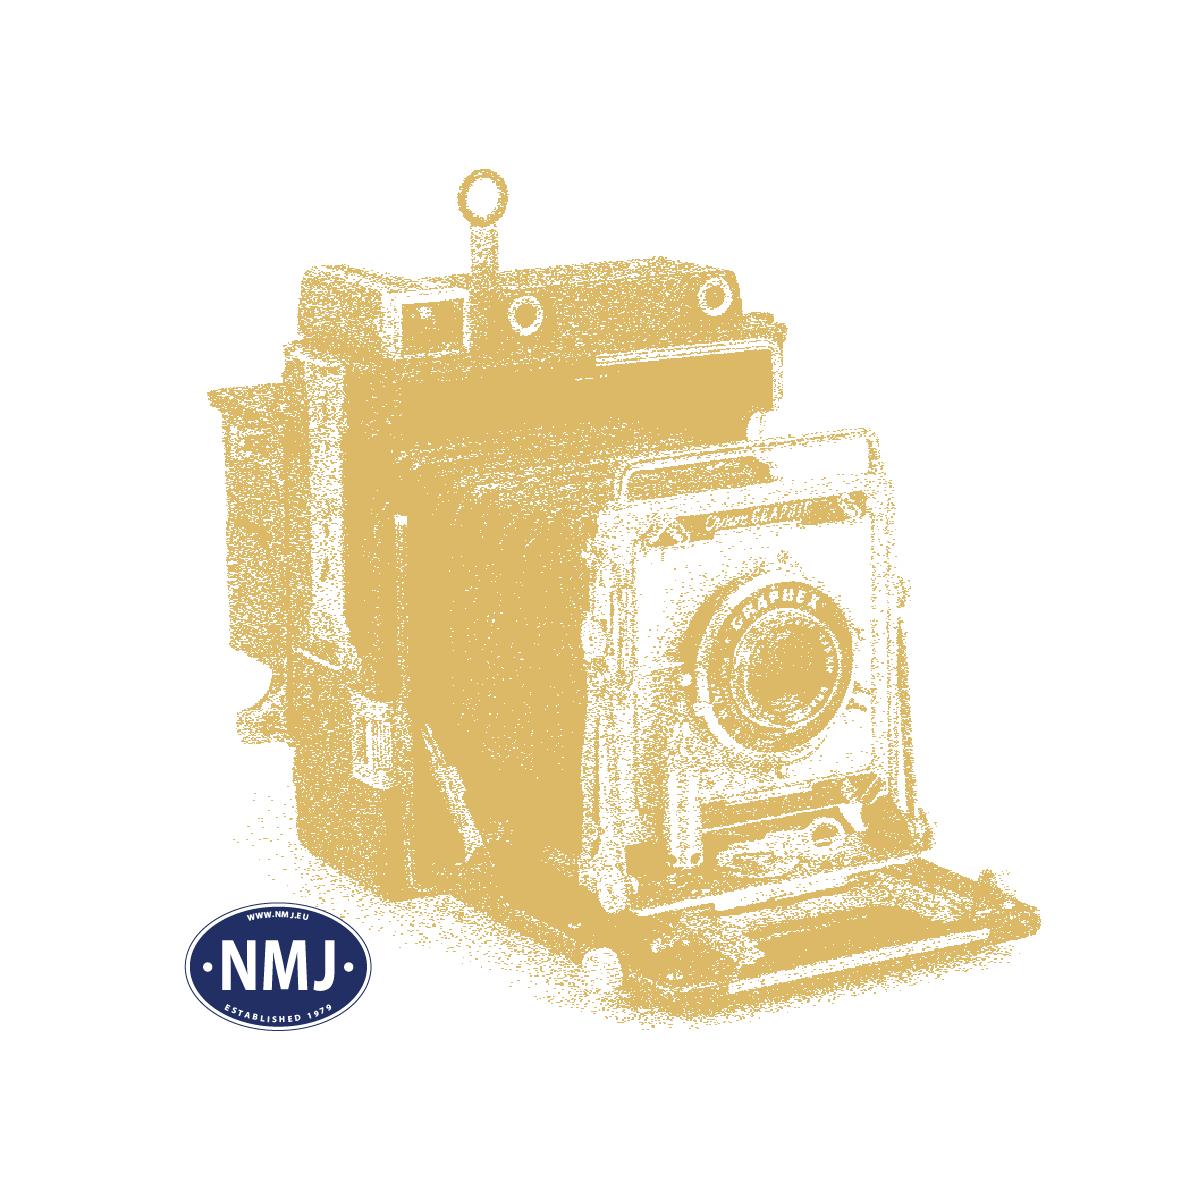 NMJT502.106 - NMJ Topline Kbps 21 76 335 3 185-0 Rungenwagen der NSB